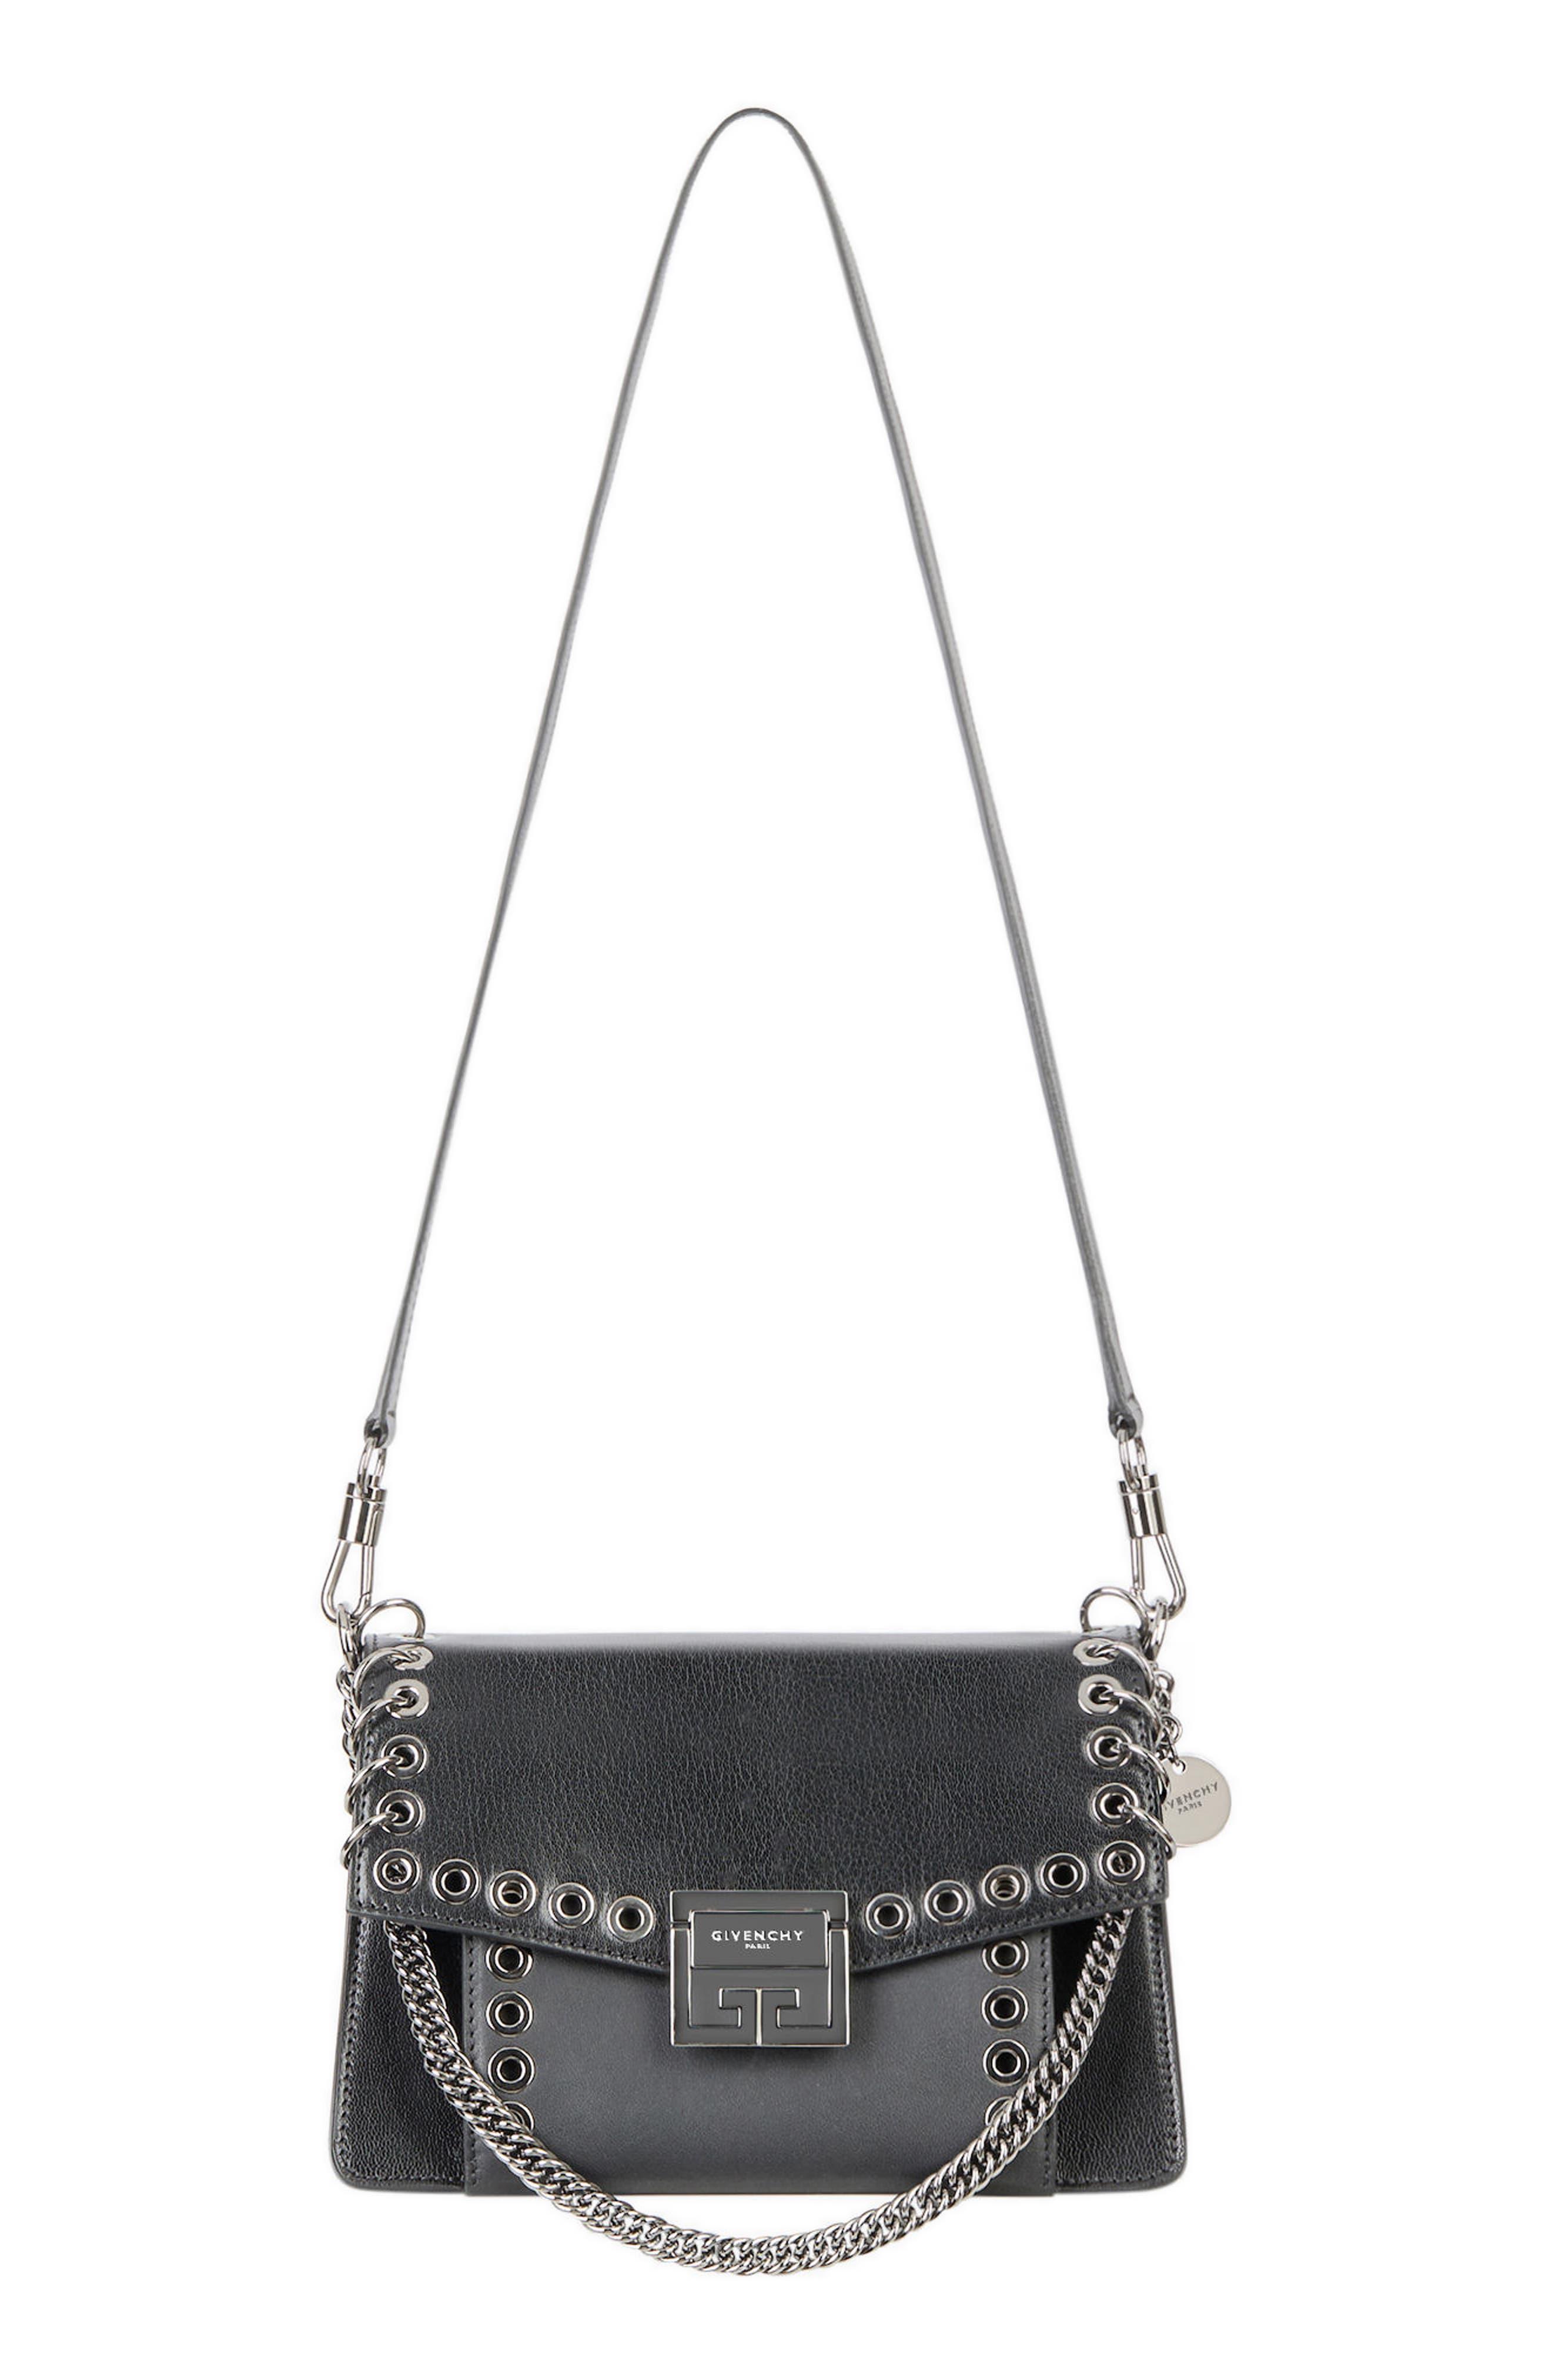 GIVENCHY,                             GV3 Eyelet and Rings Leather Shoulder Bag,                             Alternate thumbnail 7, color,                             BLACK